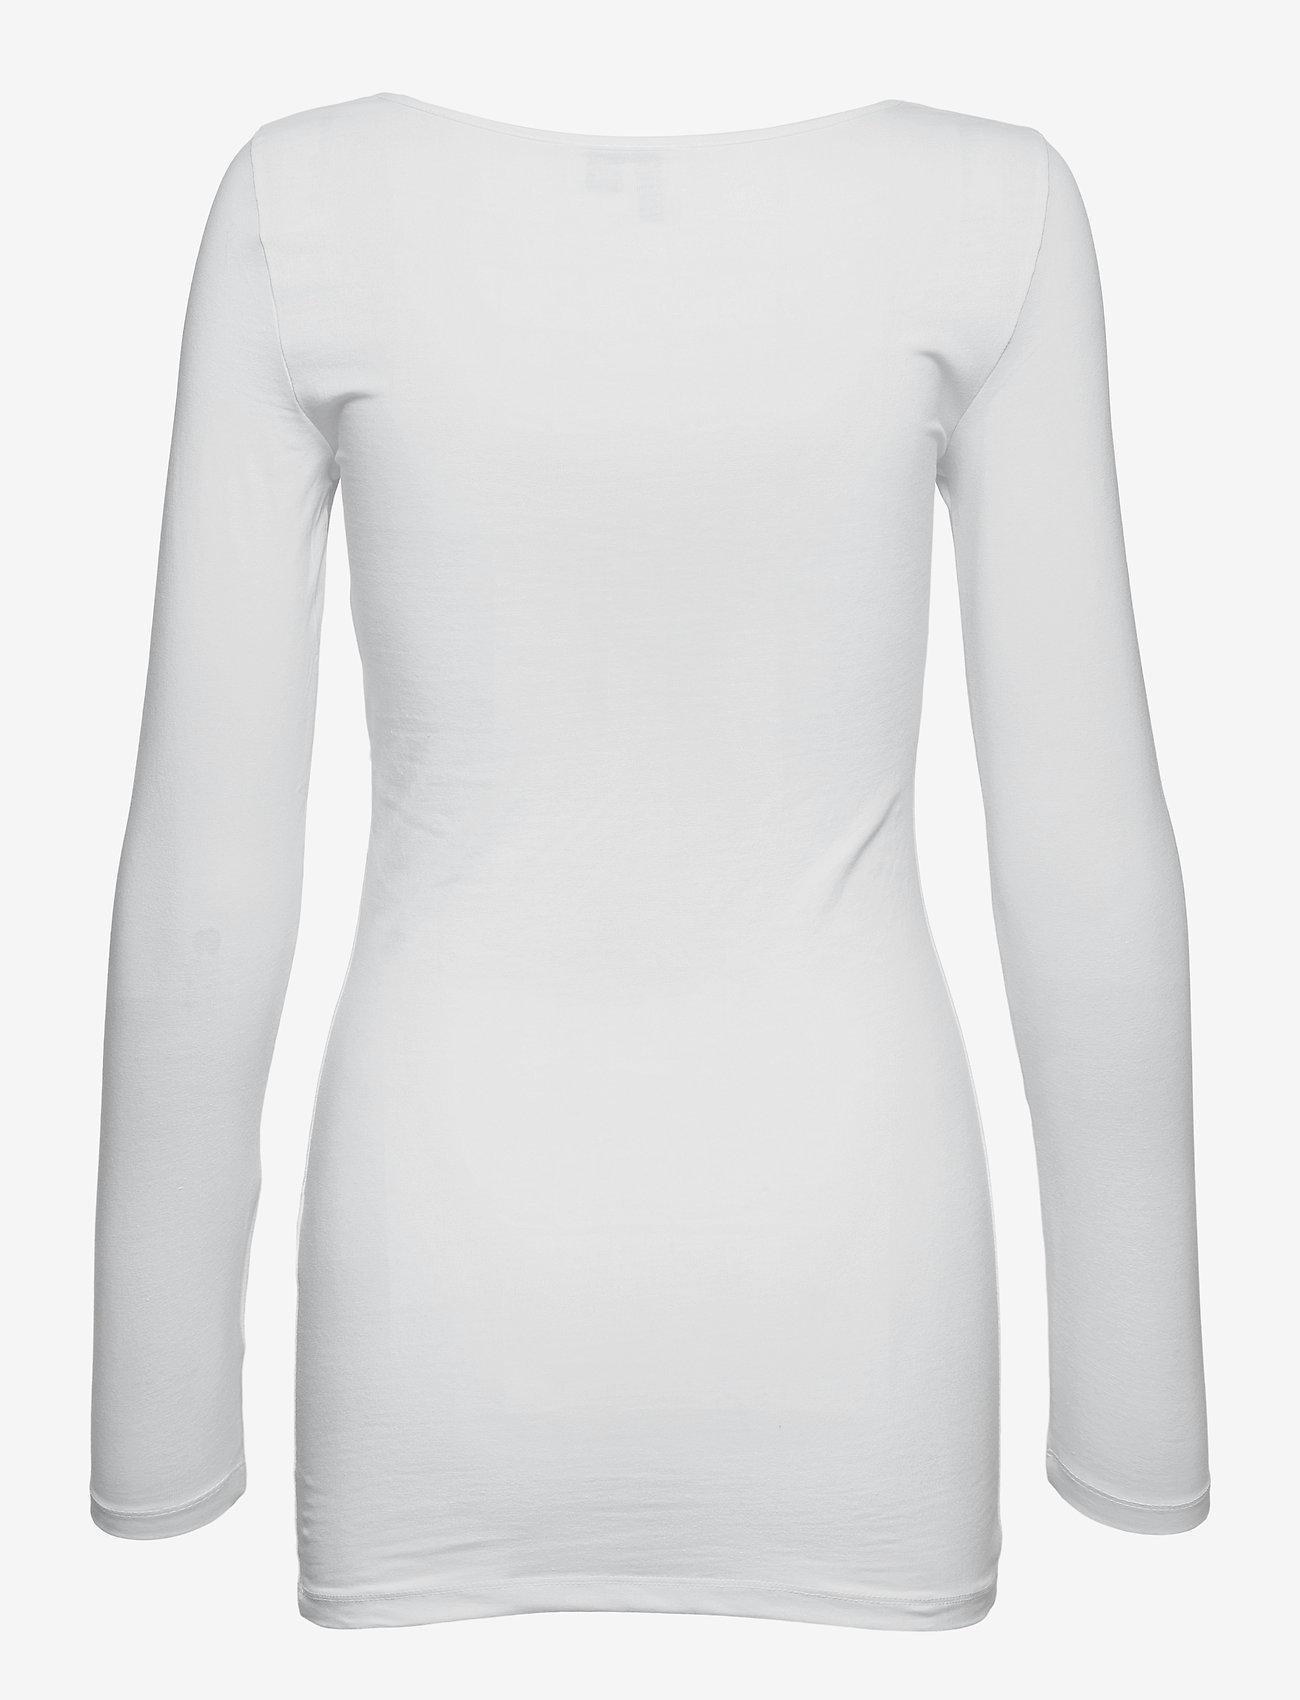 Vero Moda - VMMAXI MY LS SOFT LONG U-NECK GA - långärmade toppar - bright white - 1